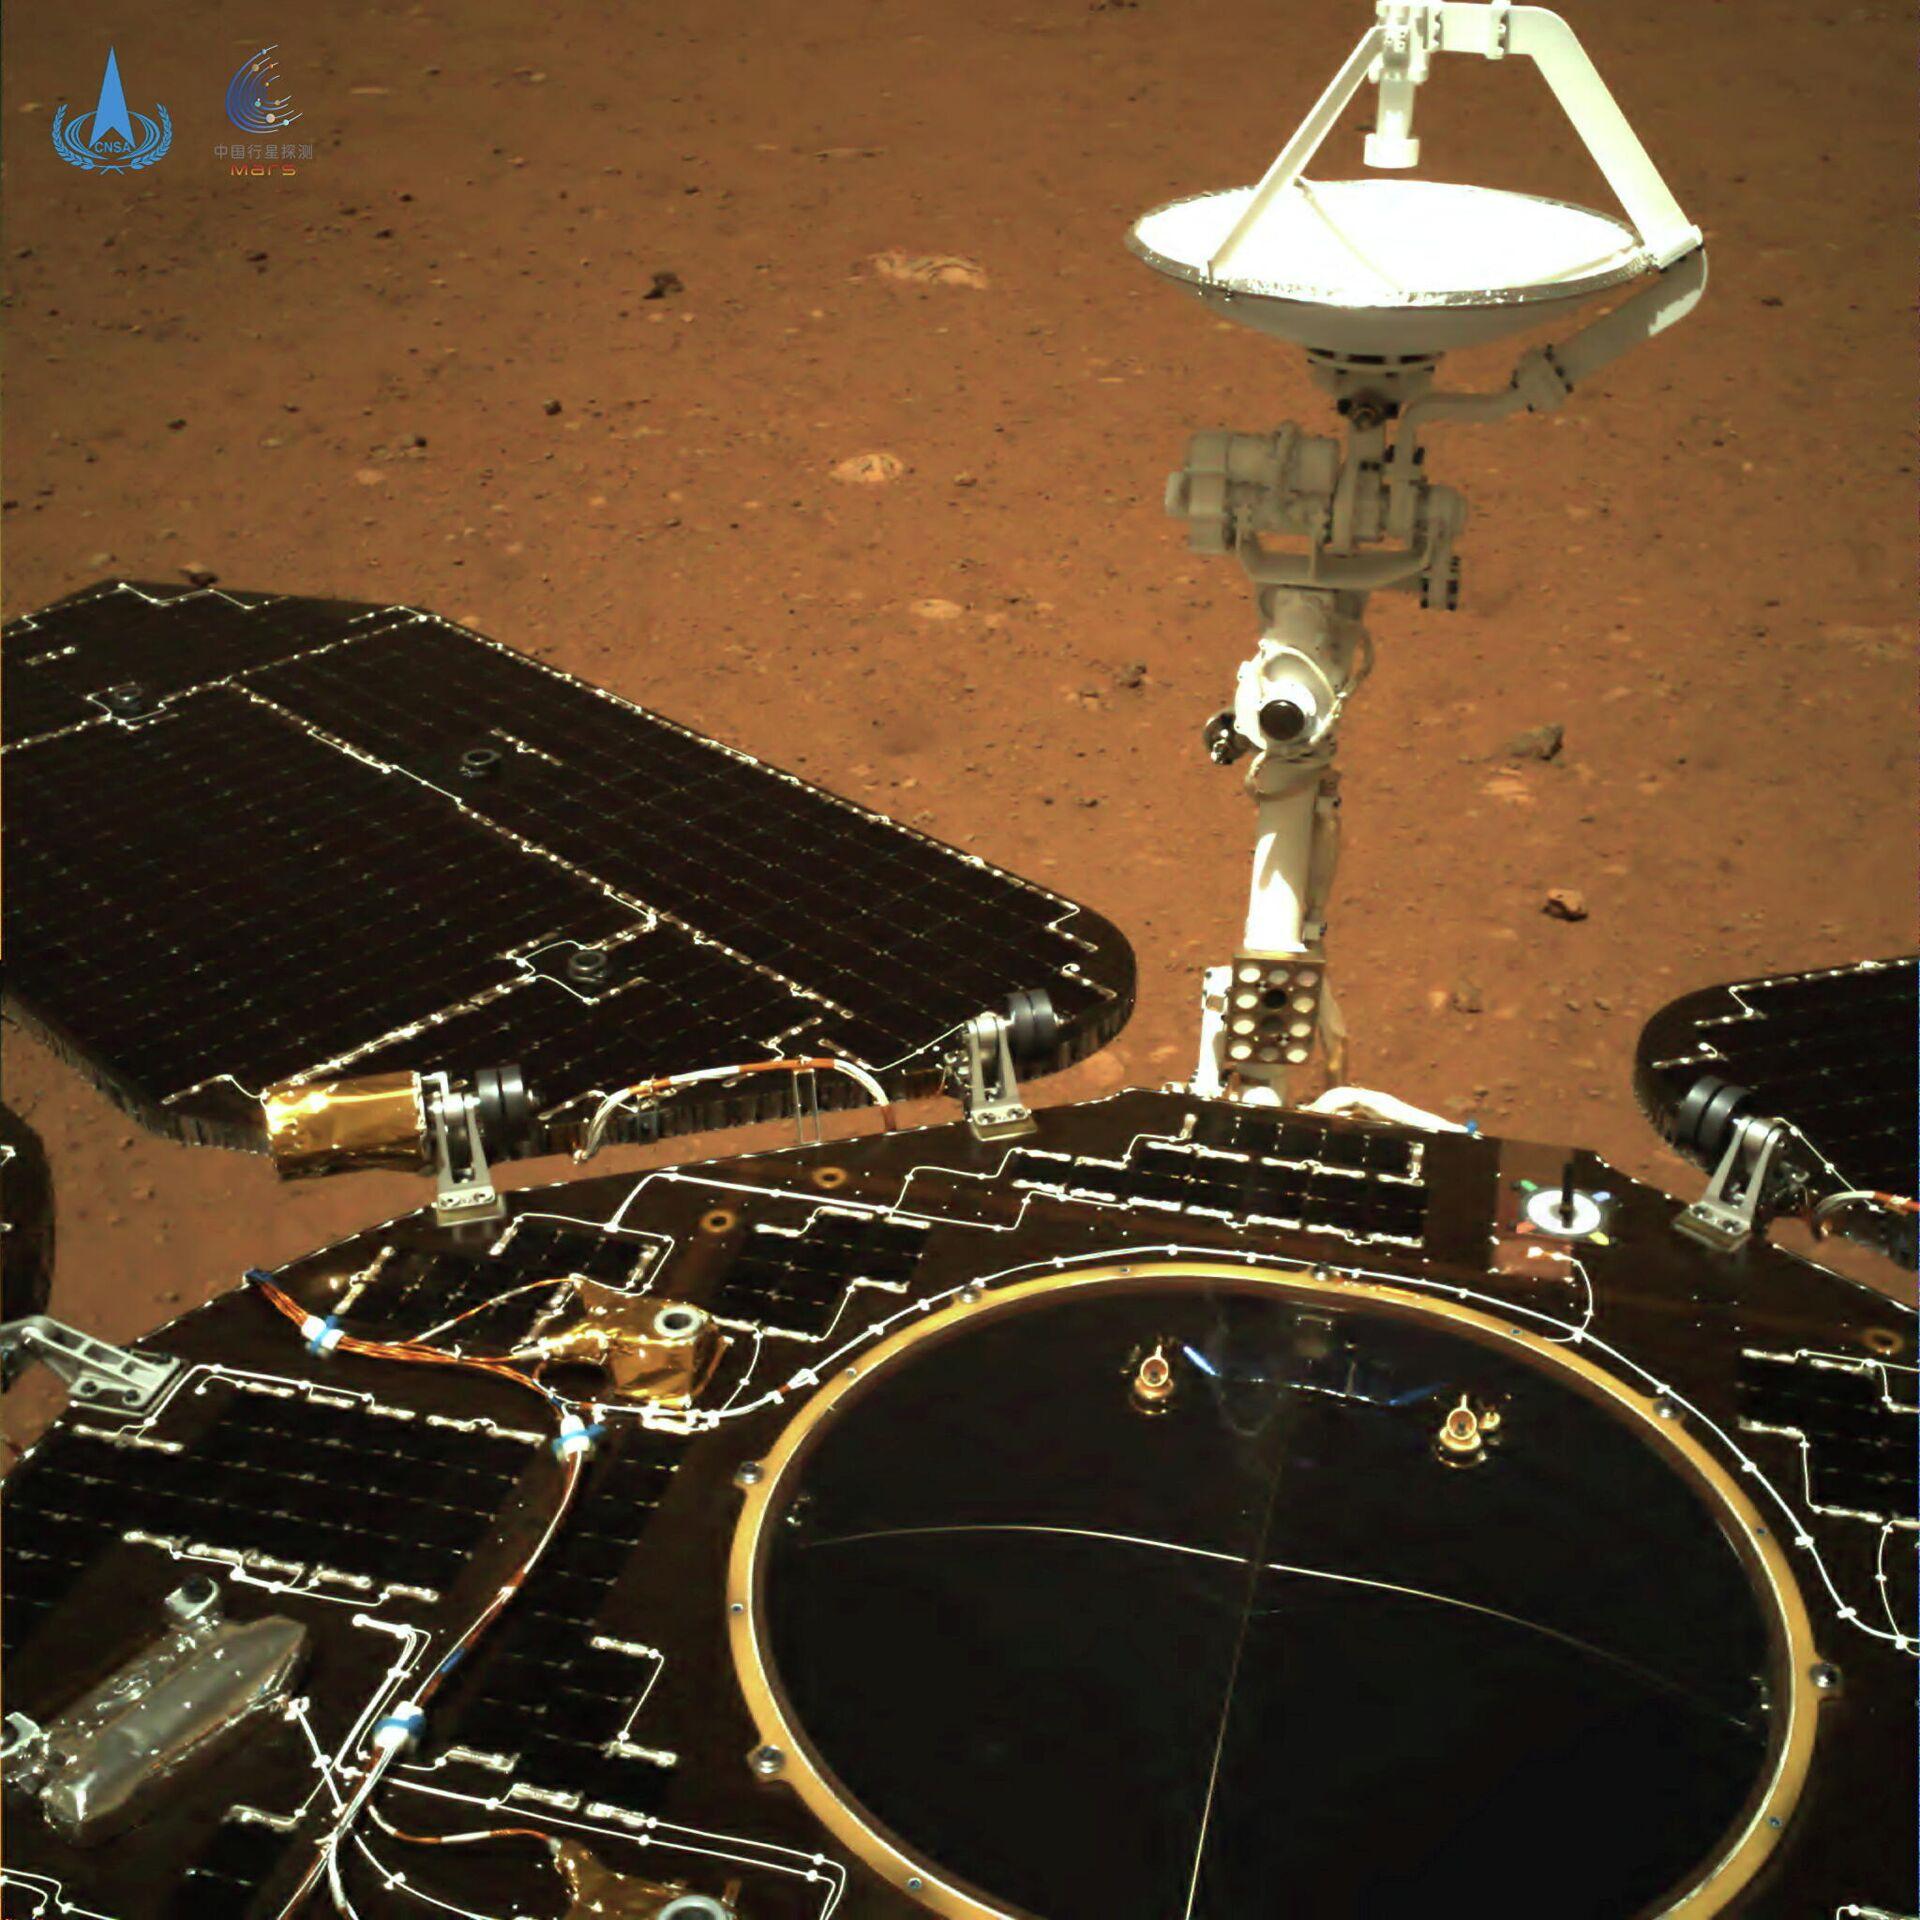 La sonda china Tianwen-1 registra sus primeras imágenes de la superficie marciana - Sputnik Mundo, 1920, 19.05.2021